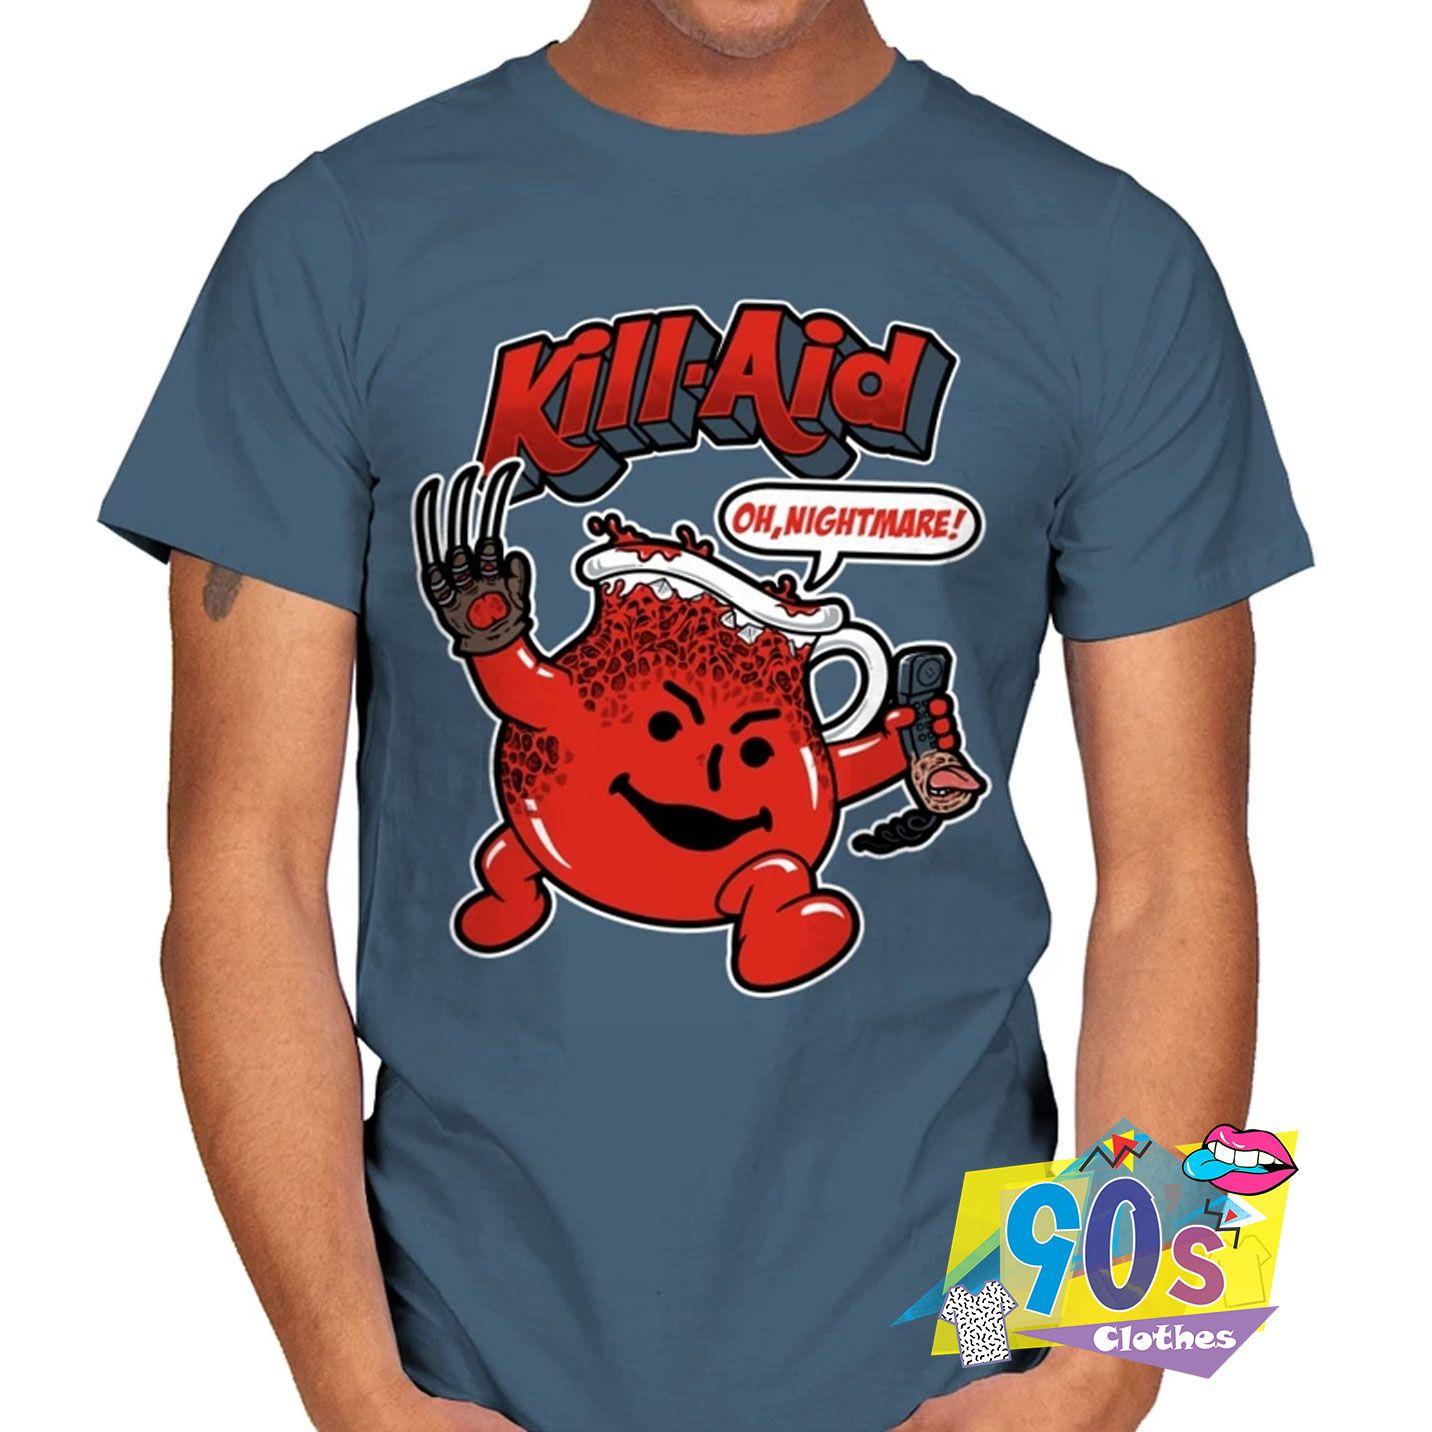 Kill Aid Oh Nightmare T shirt #decadedayoutfits